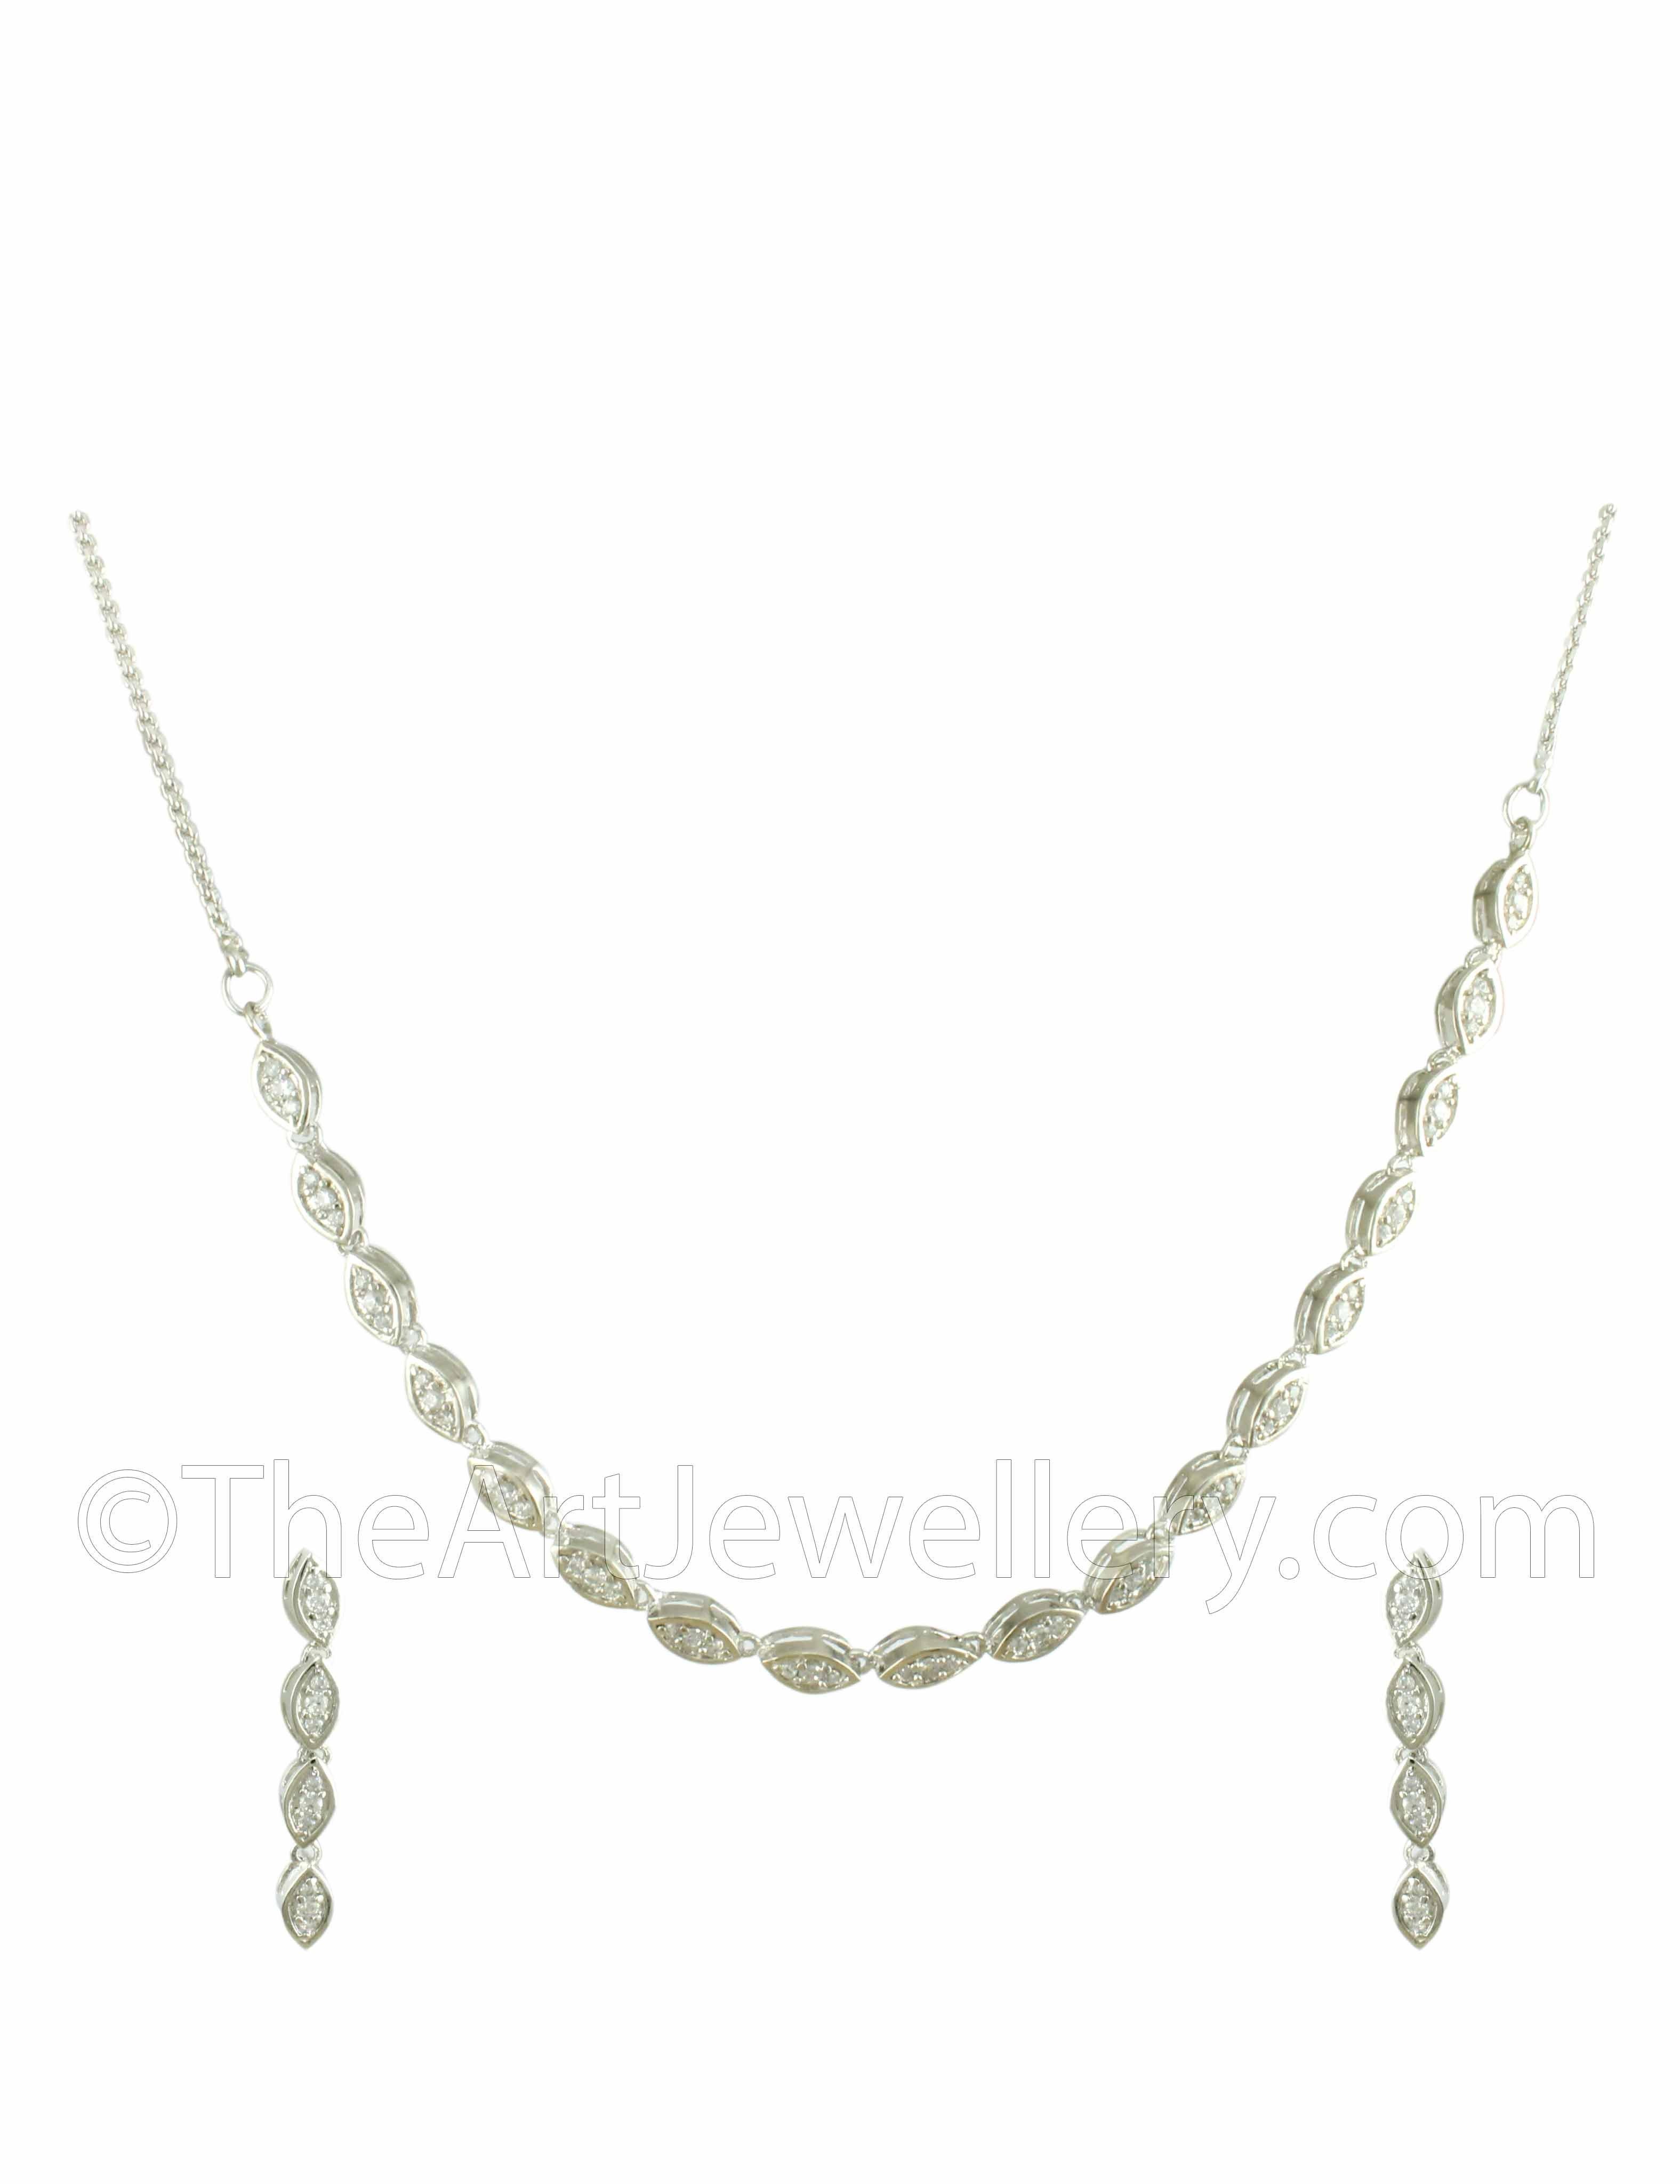 Line Art Jewellery : Single line marquise cz diamond necklace set online shopping